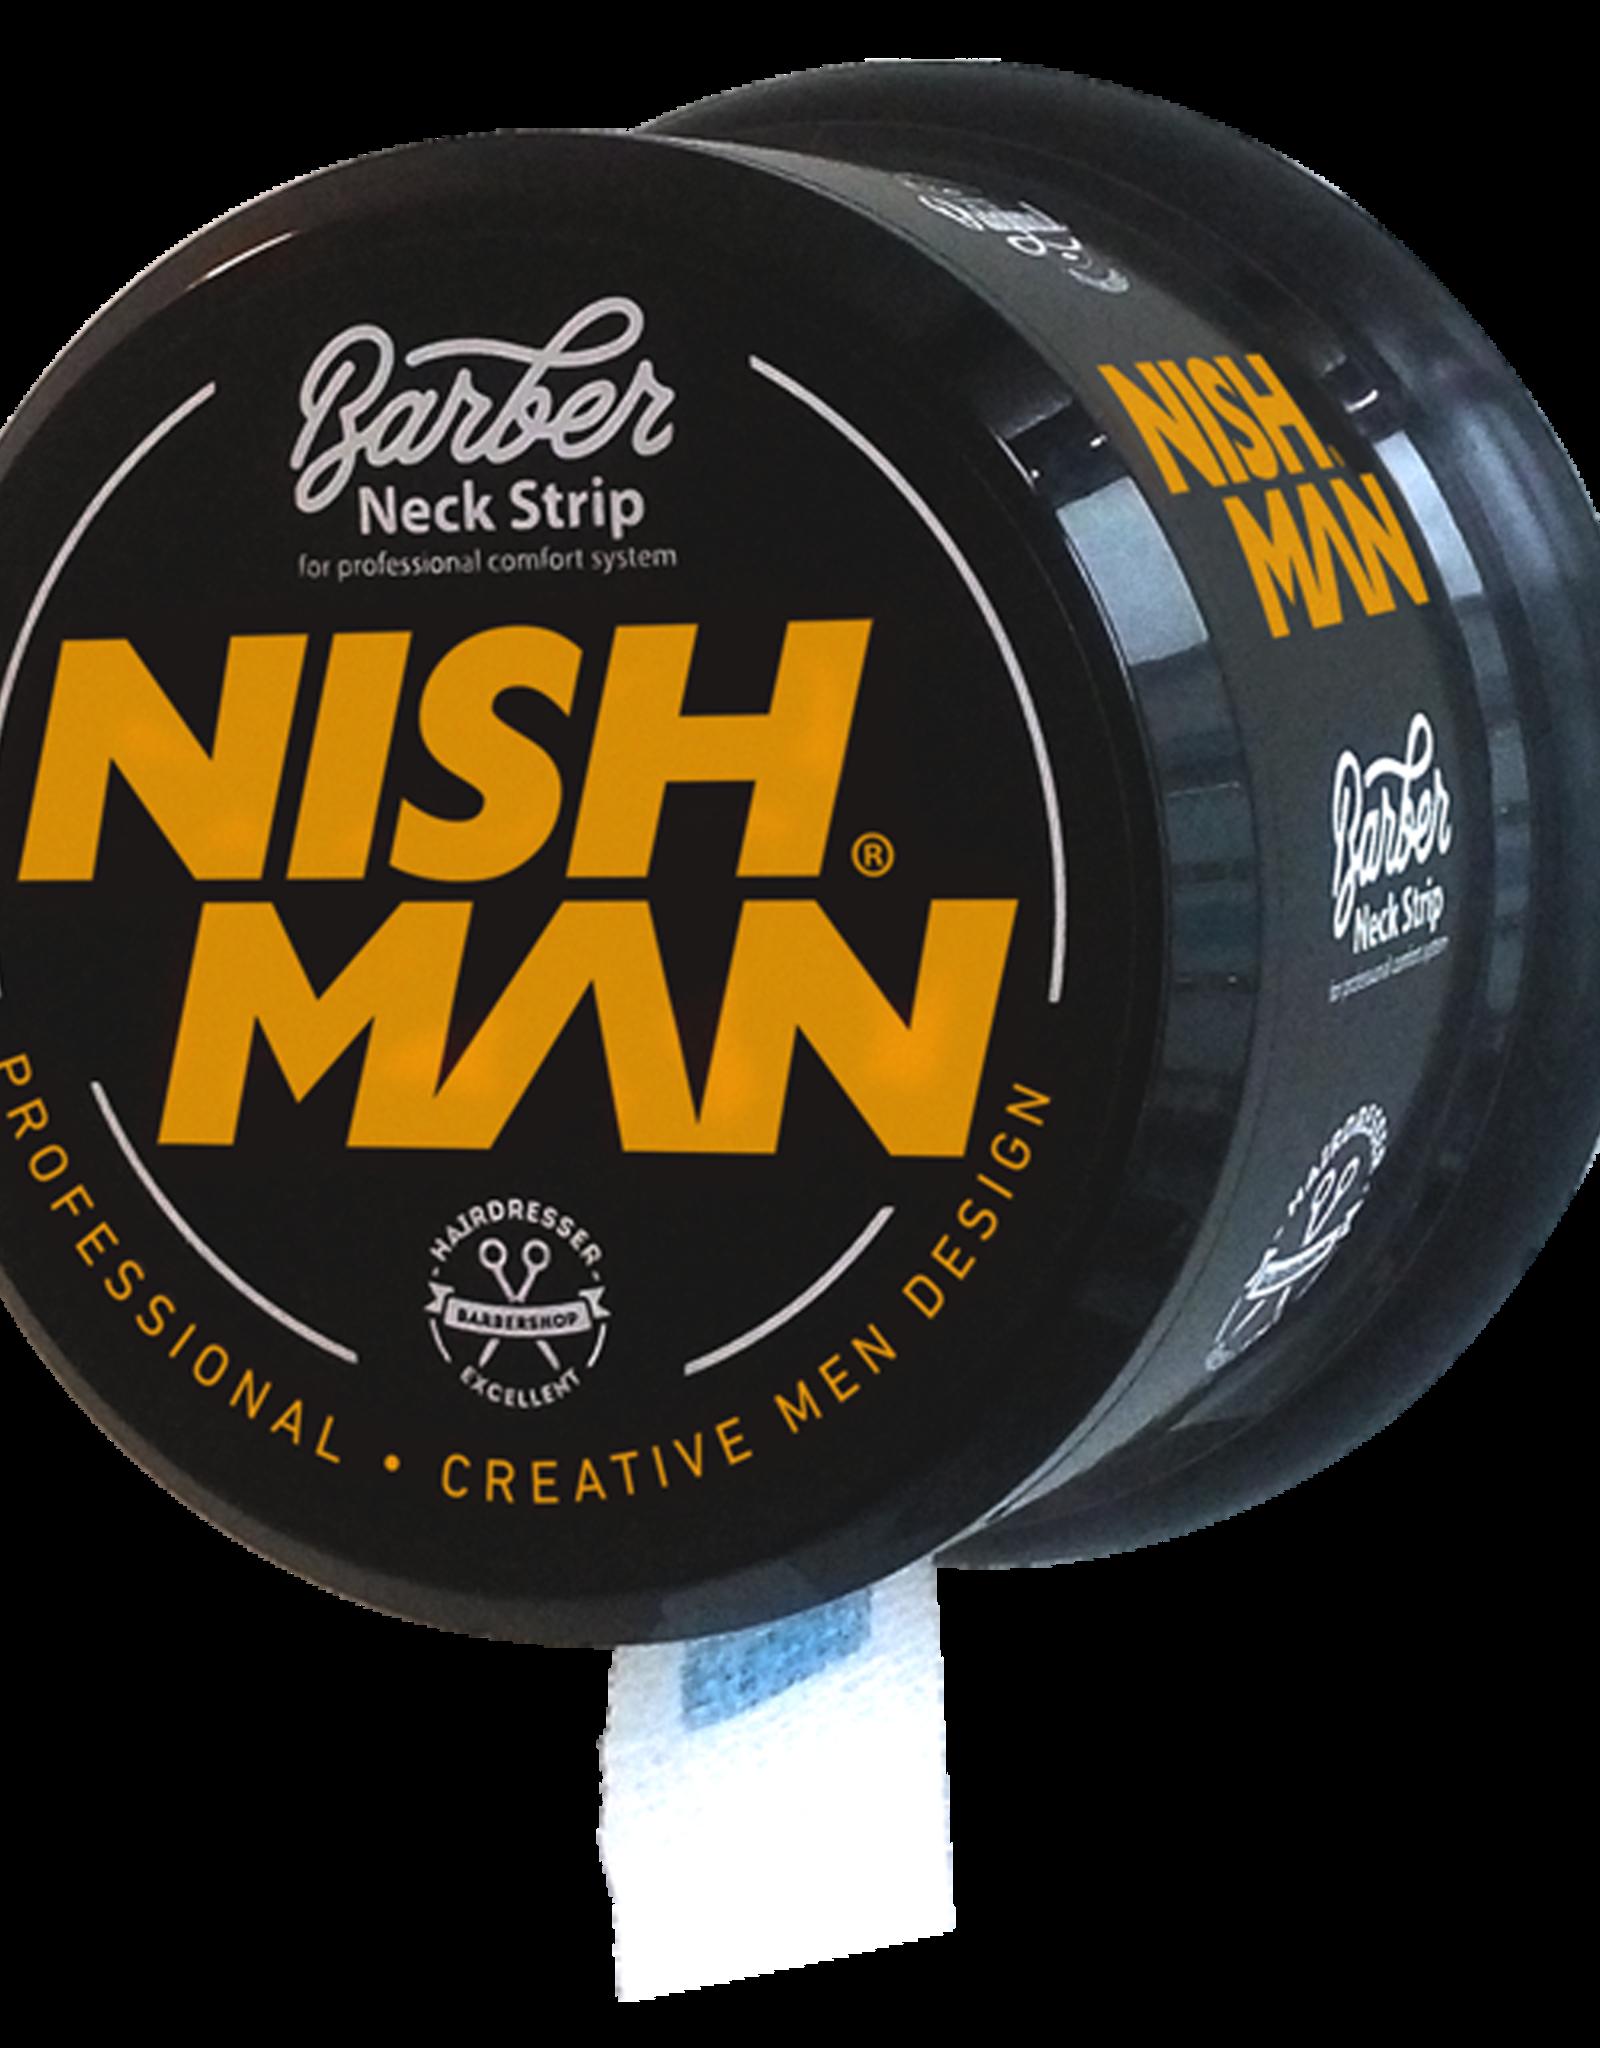 Nishman Barber Neck Strip Dispenser